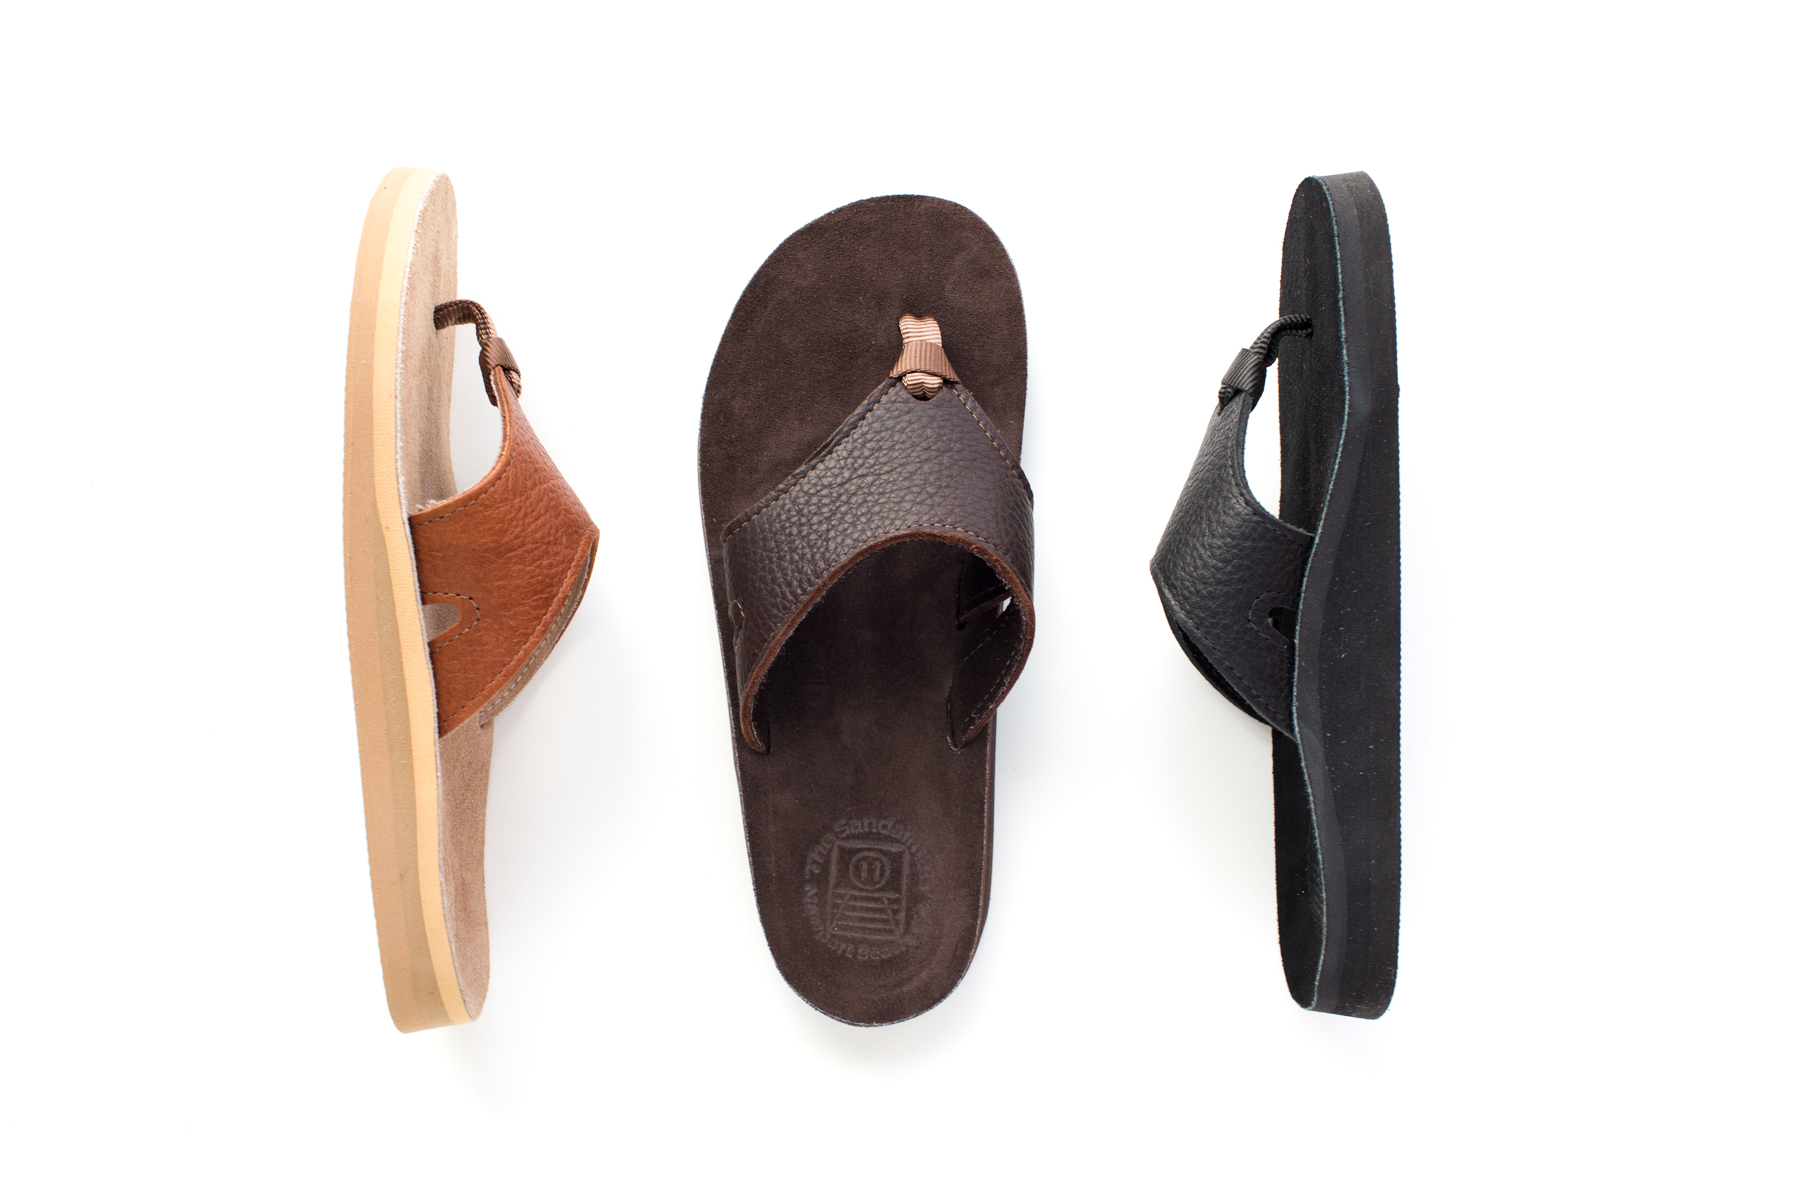 Sandals4.jpg